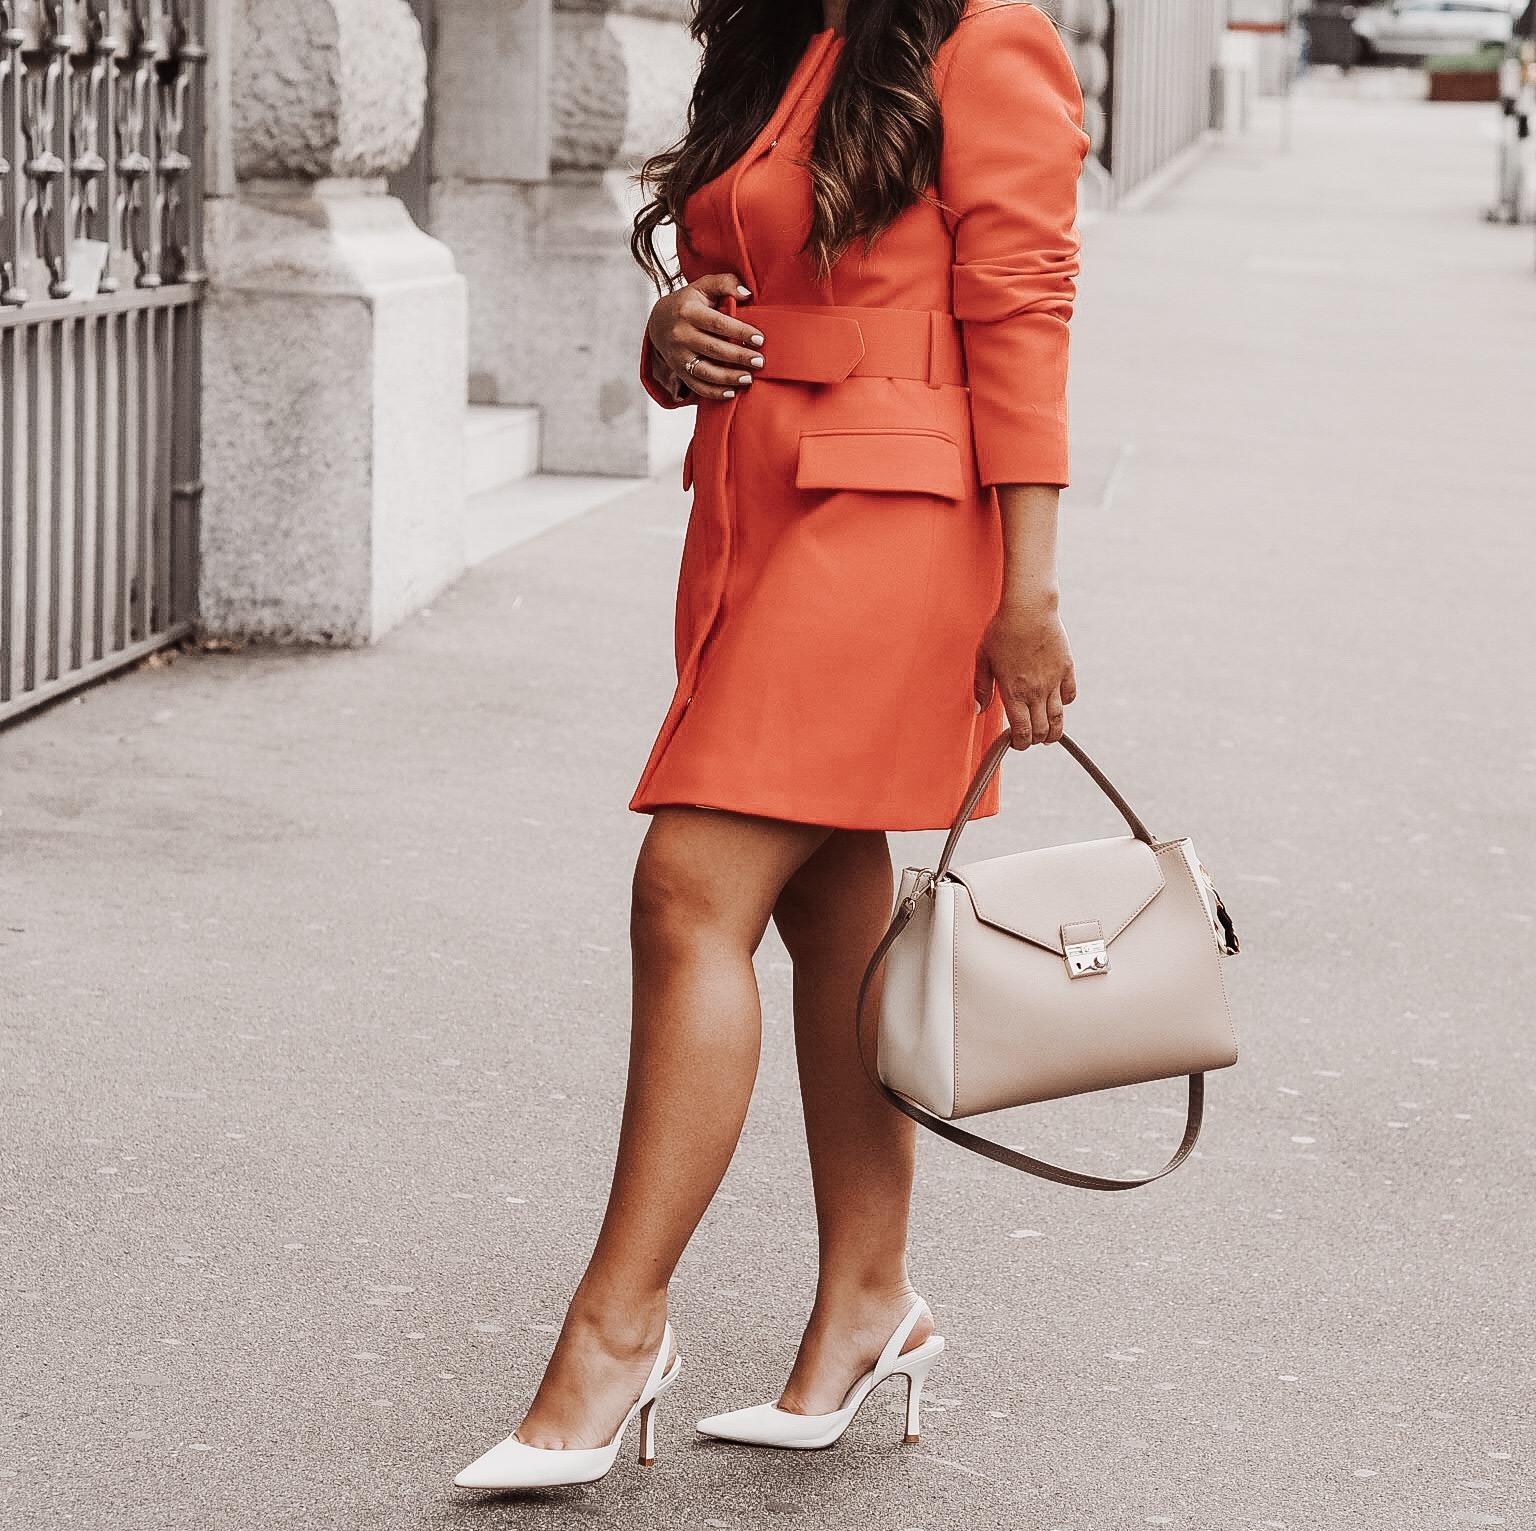 Beige bag - orange dress - white heels.JPG